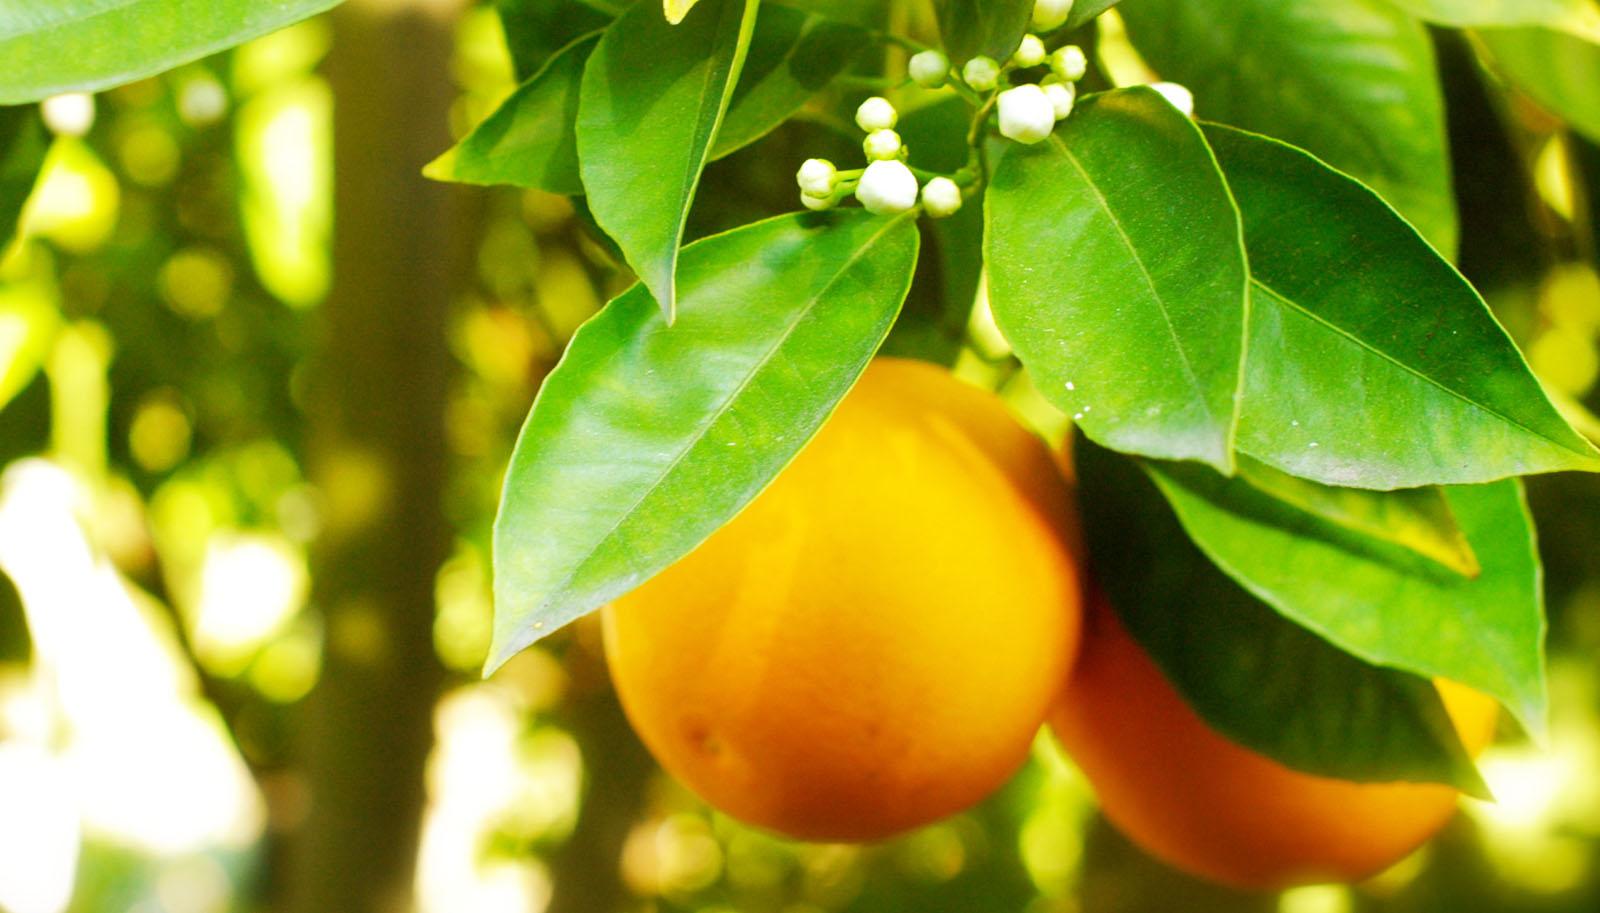 naranjas, orange fruit, Frutéate, Costa de Azahar, exportación de naranjas